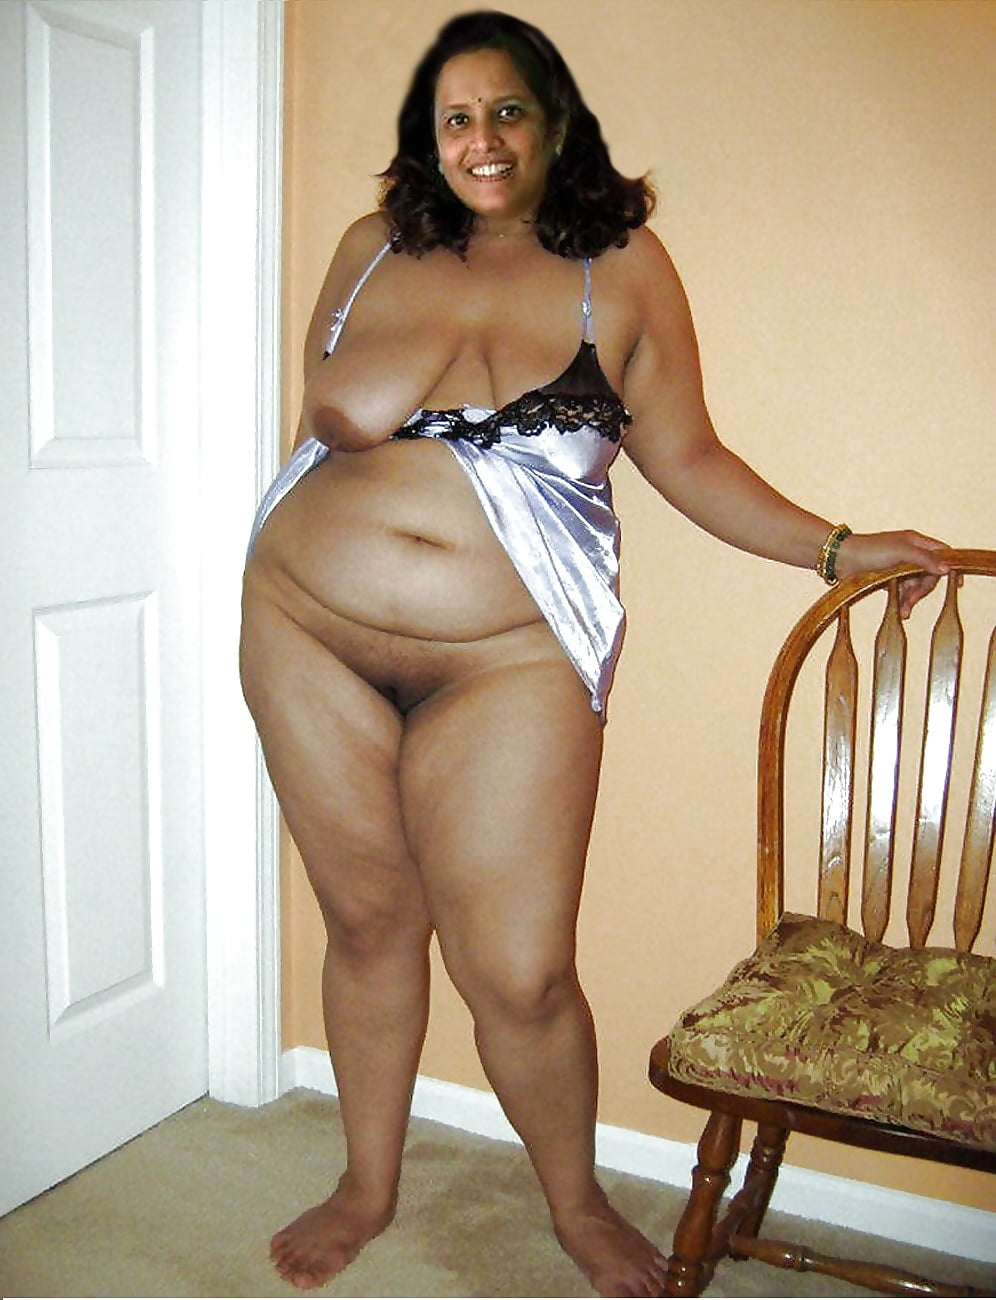 fat-nude-bbw-aunty-pic-little-gir-nudes